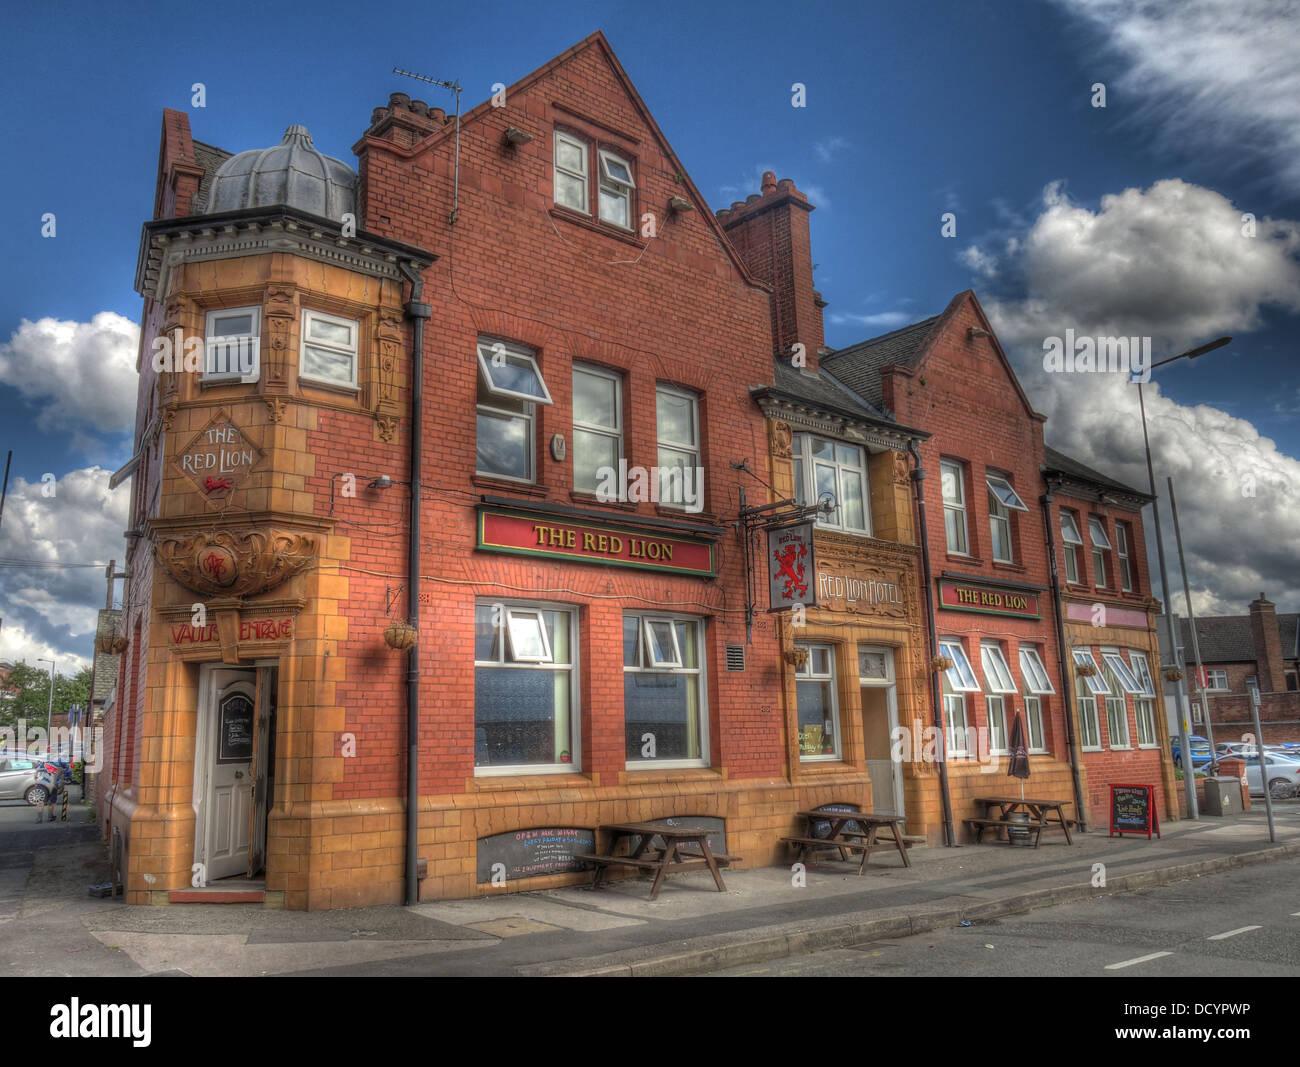 Dieses Stockfoto: Das Red Lion Hotel, Winwick Road, Warrington, Cheshire, England, UK, WA2 7DH, erbaut 1825 - DCYPWP